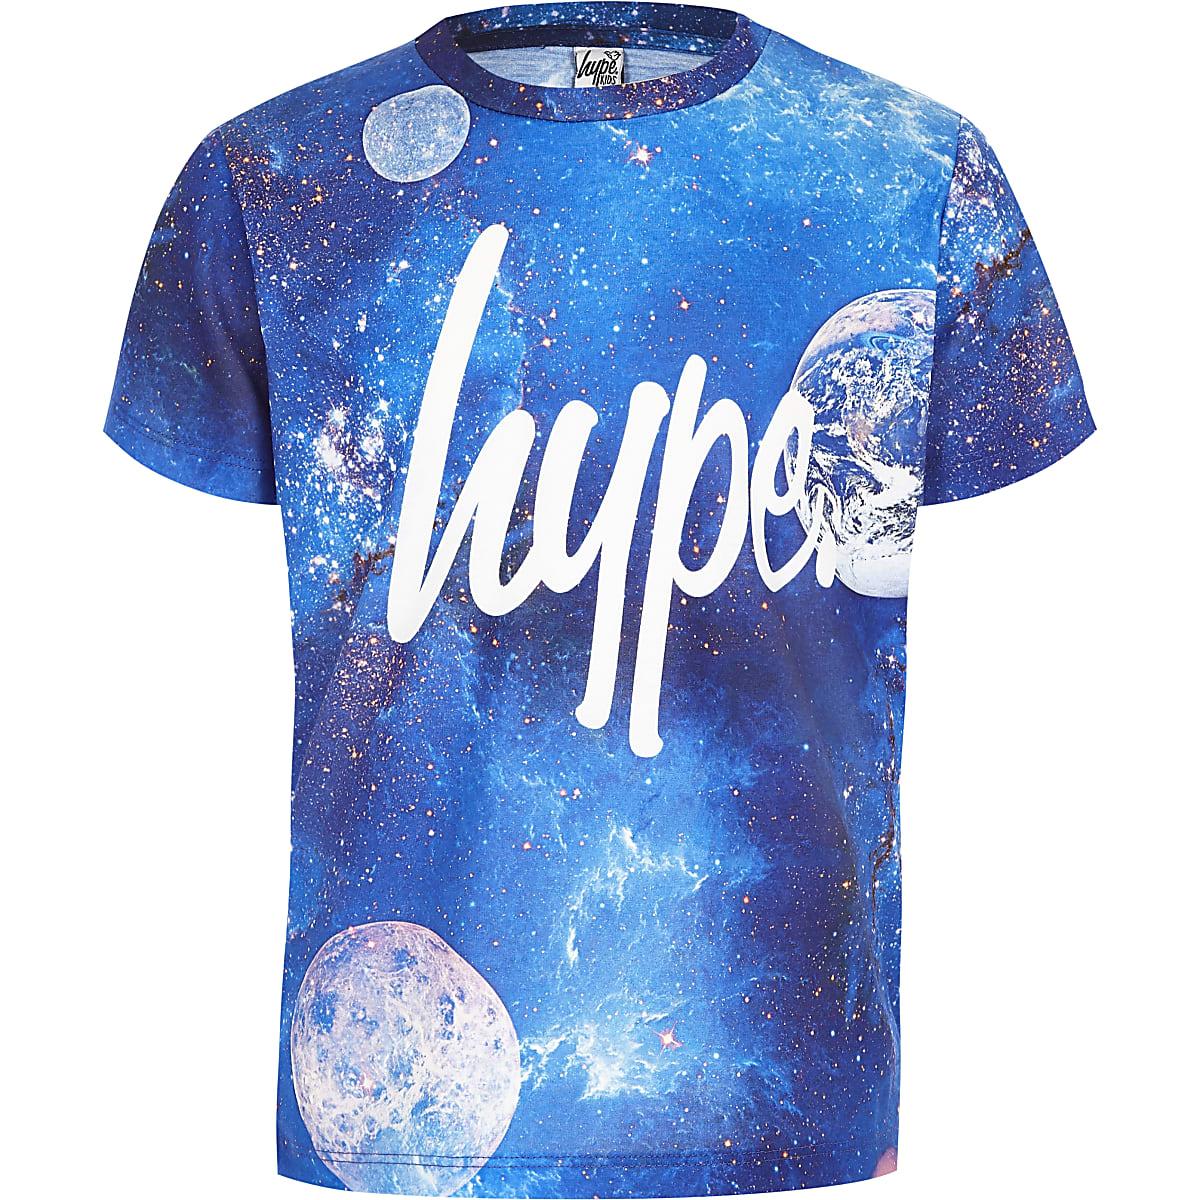 Boys Hype blue cosmic T-shirt